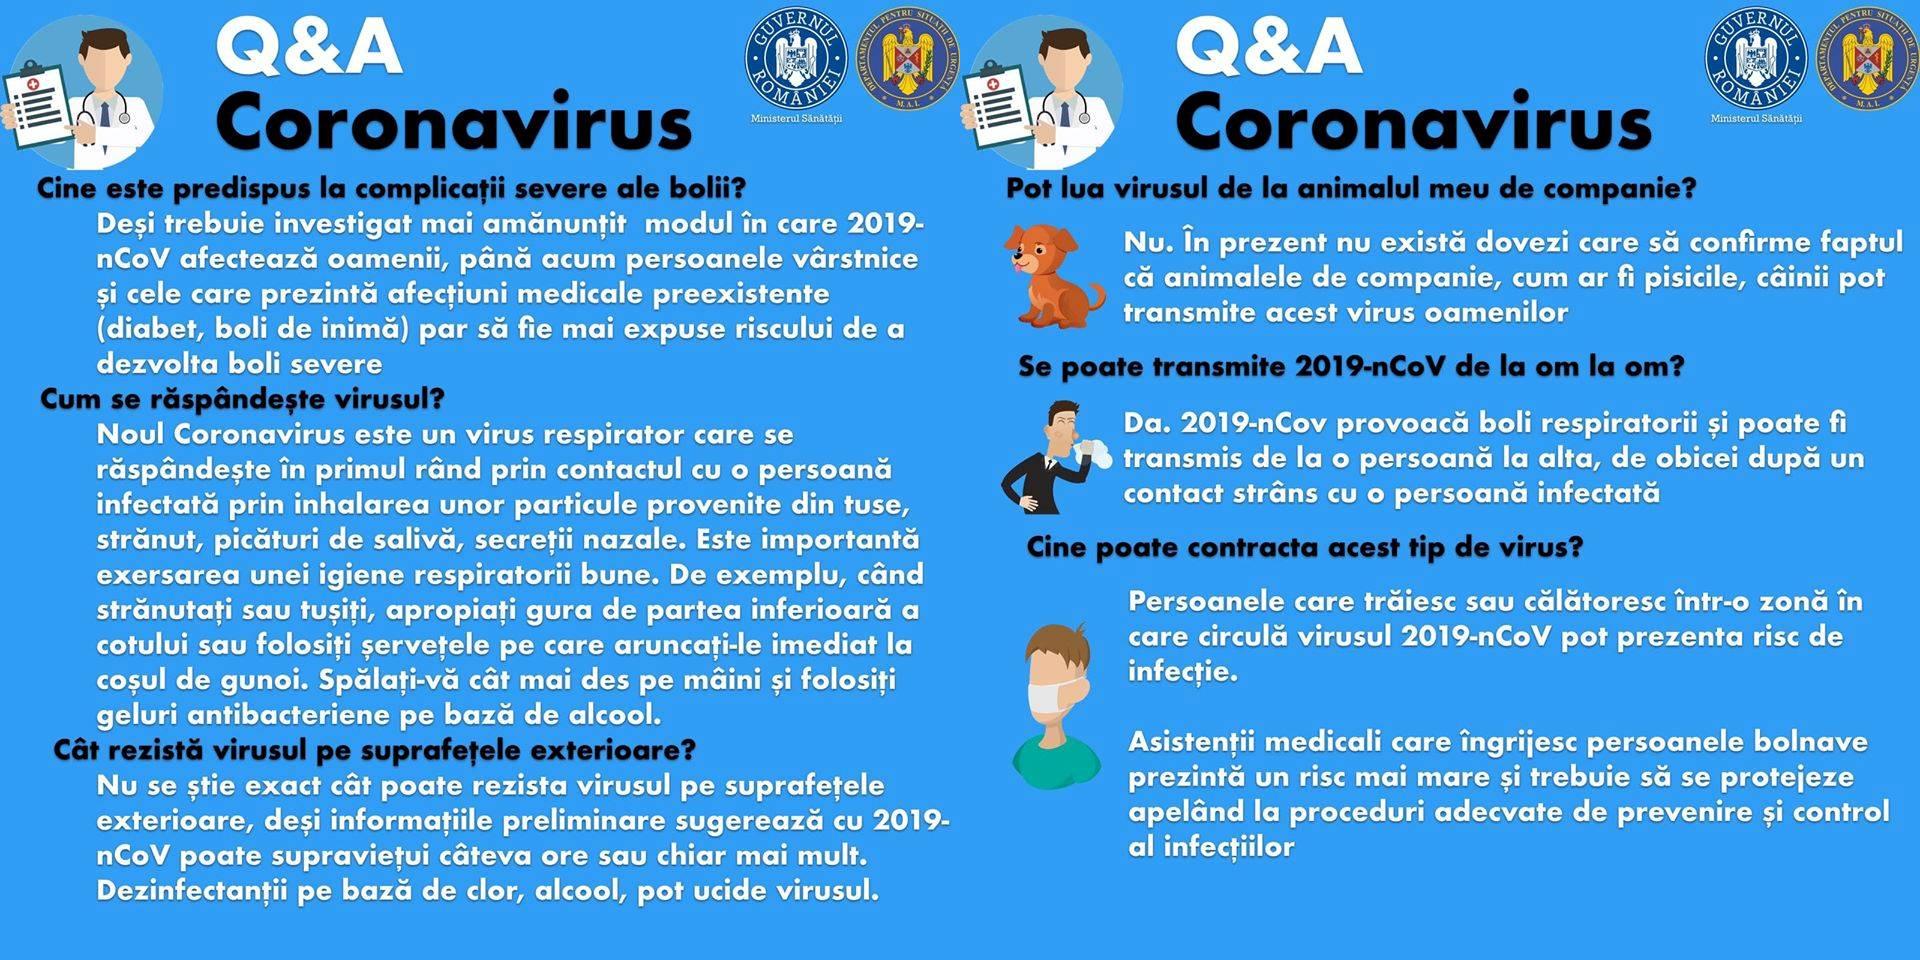 Coronavirus masuri protectie infectare